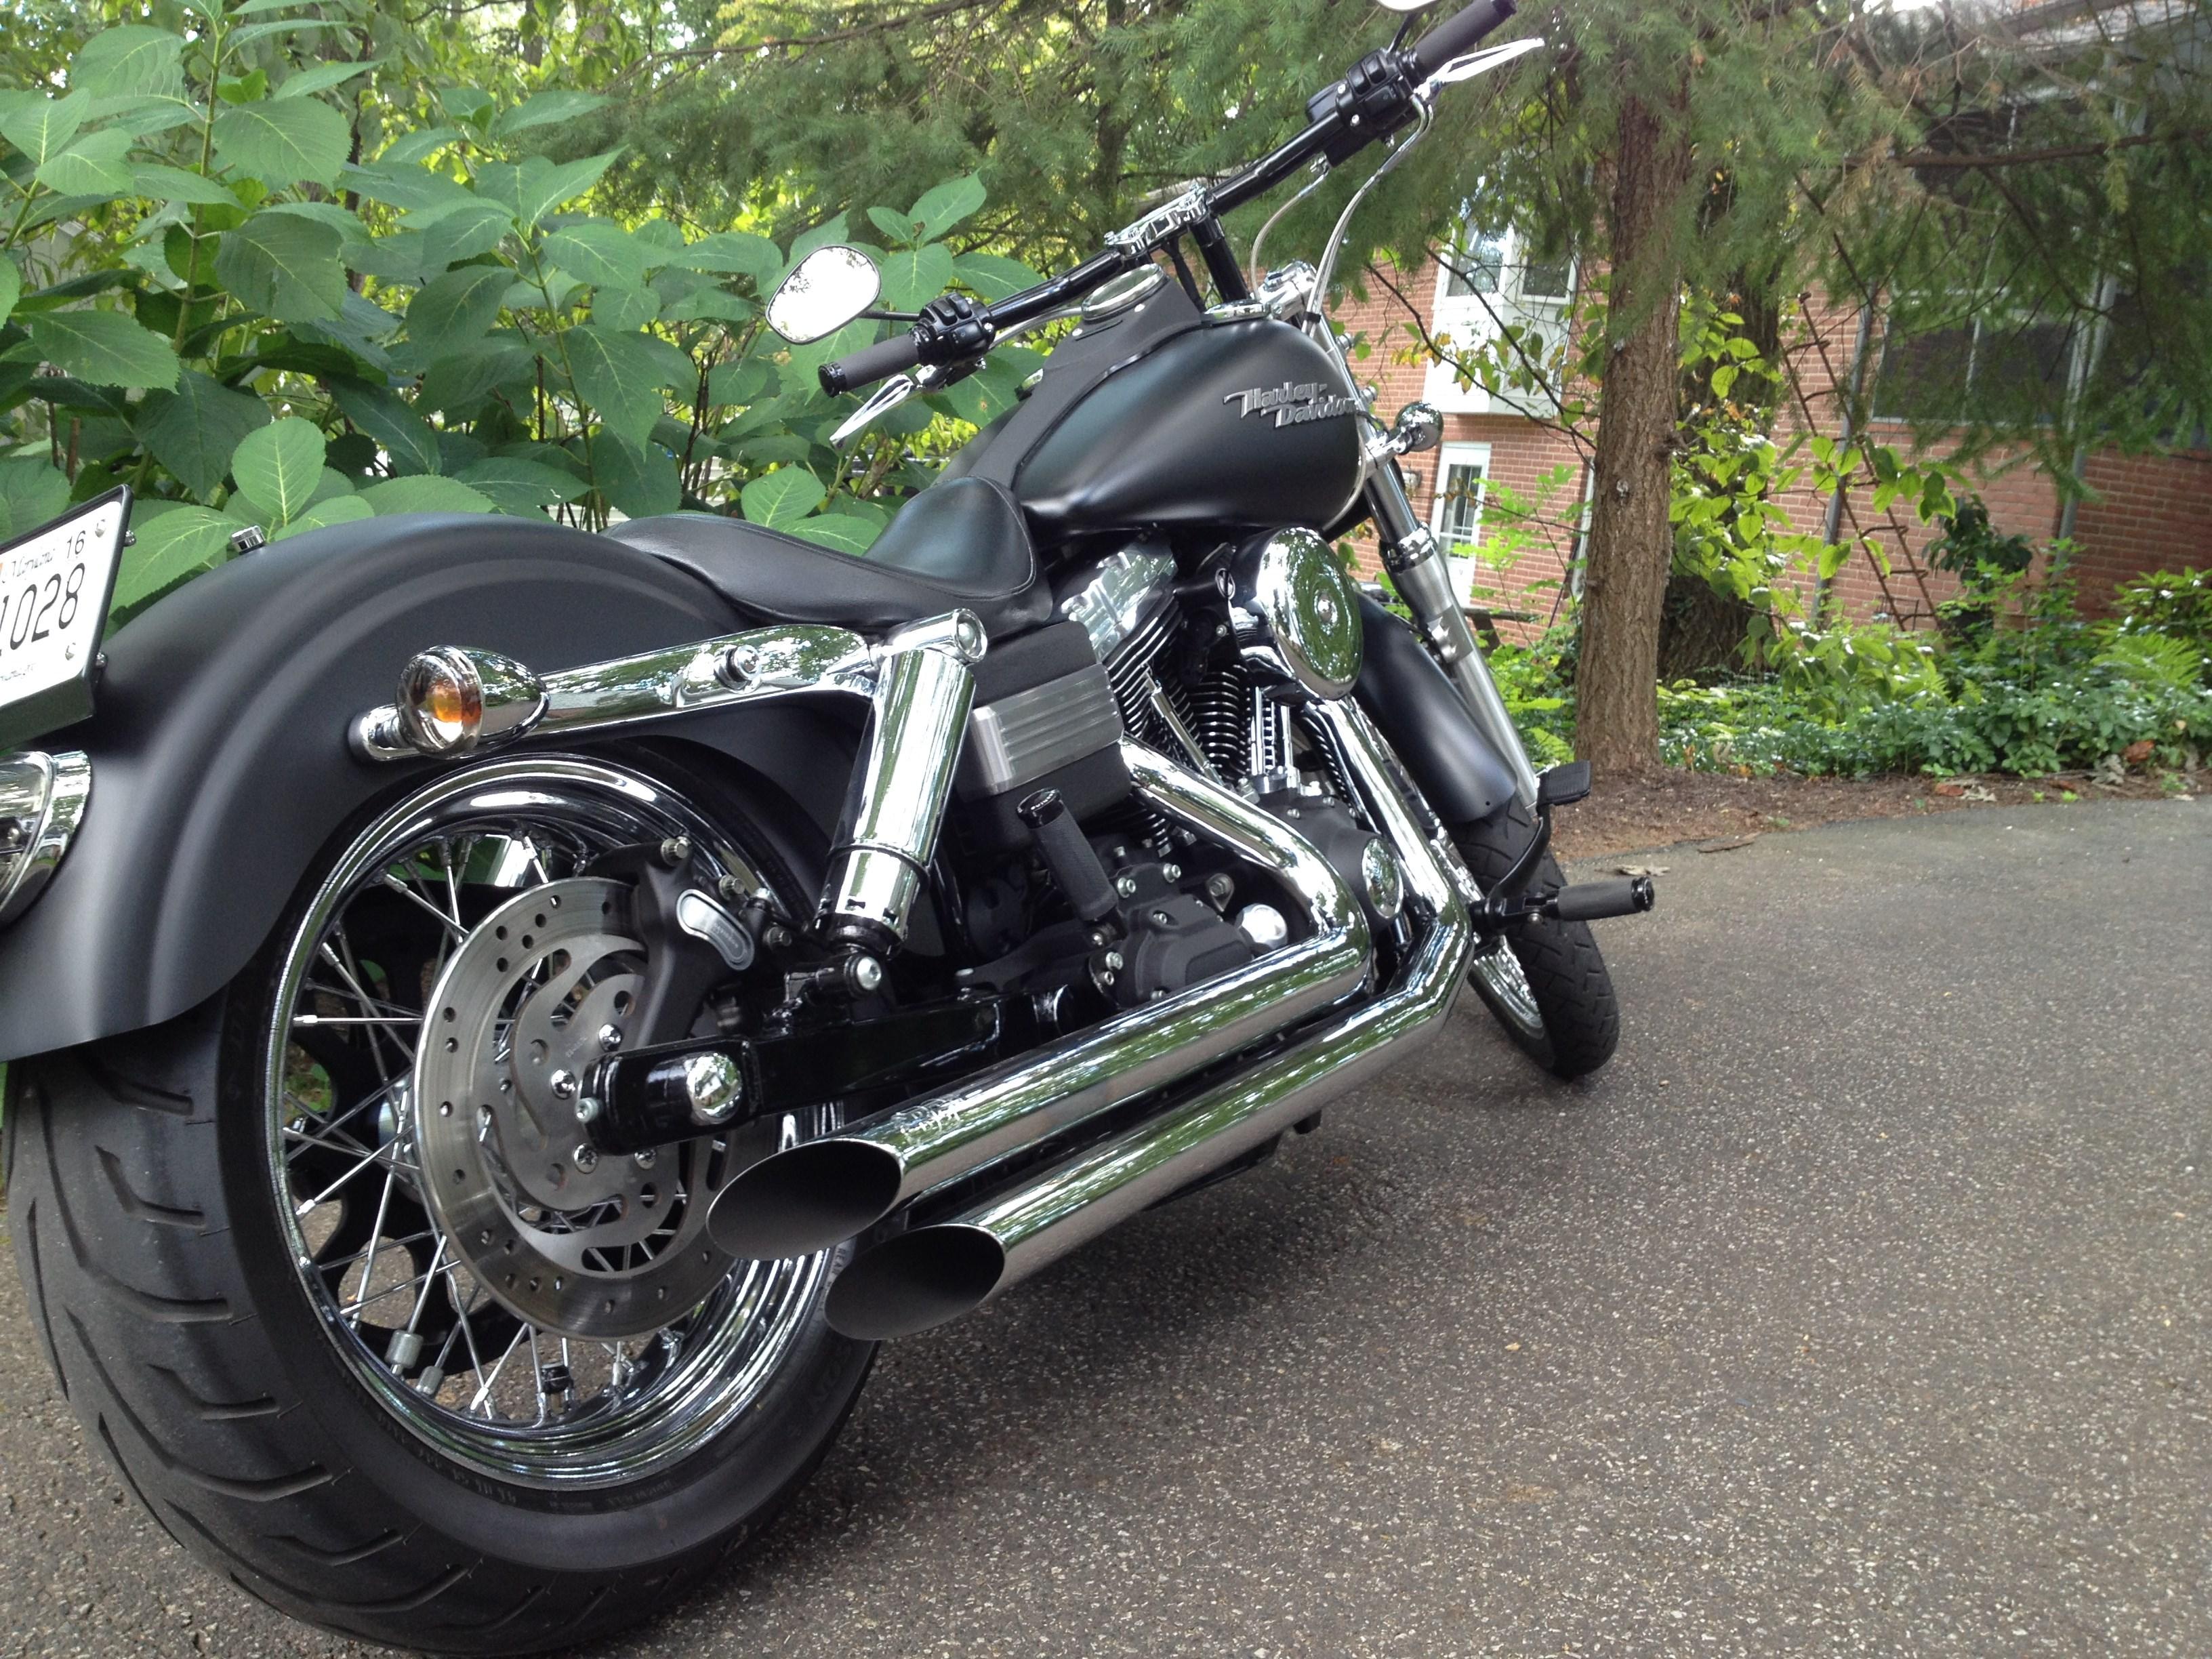 Harley Davidson Wiring Harness Also Harley Davidson Fat Bob Custom